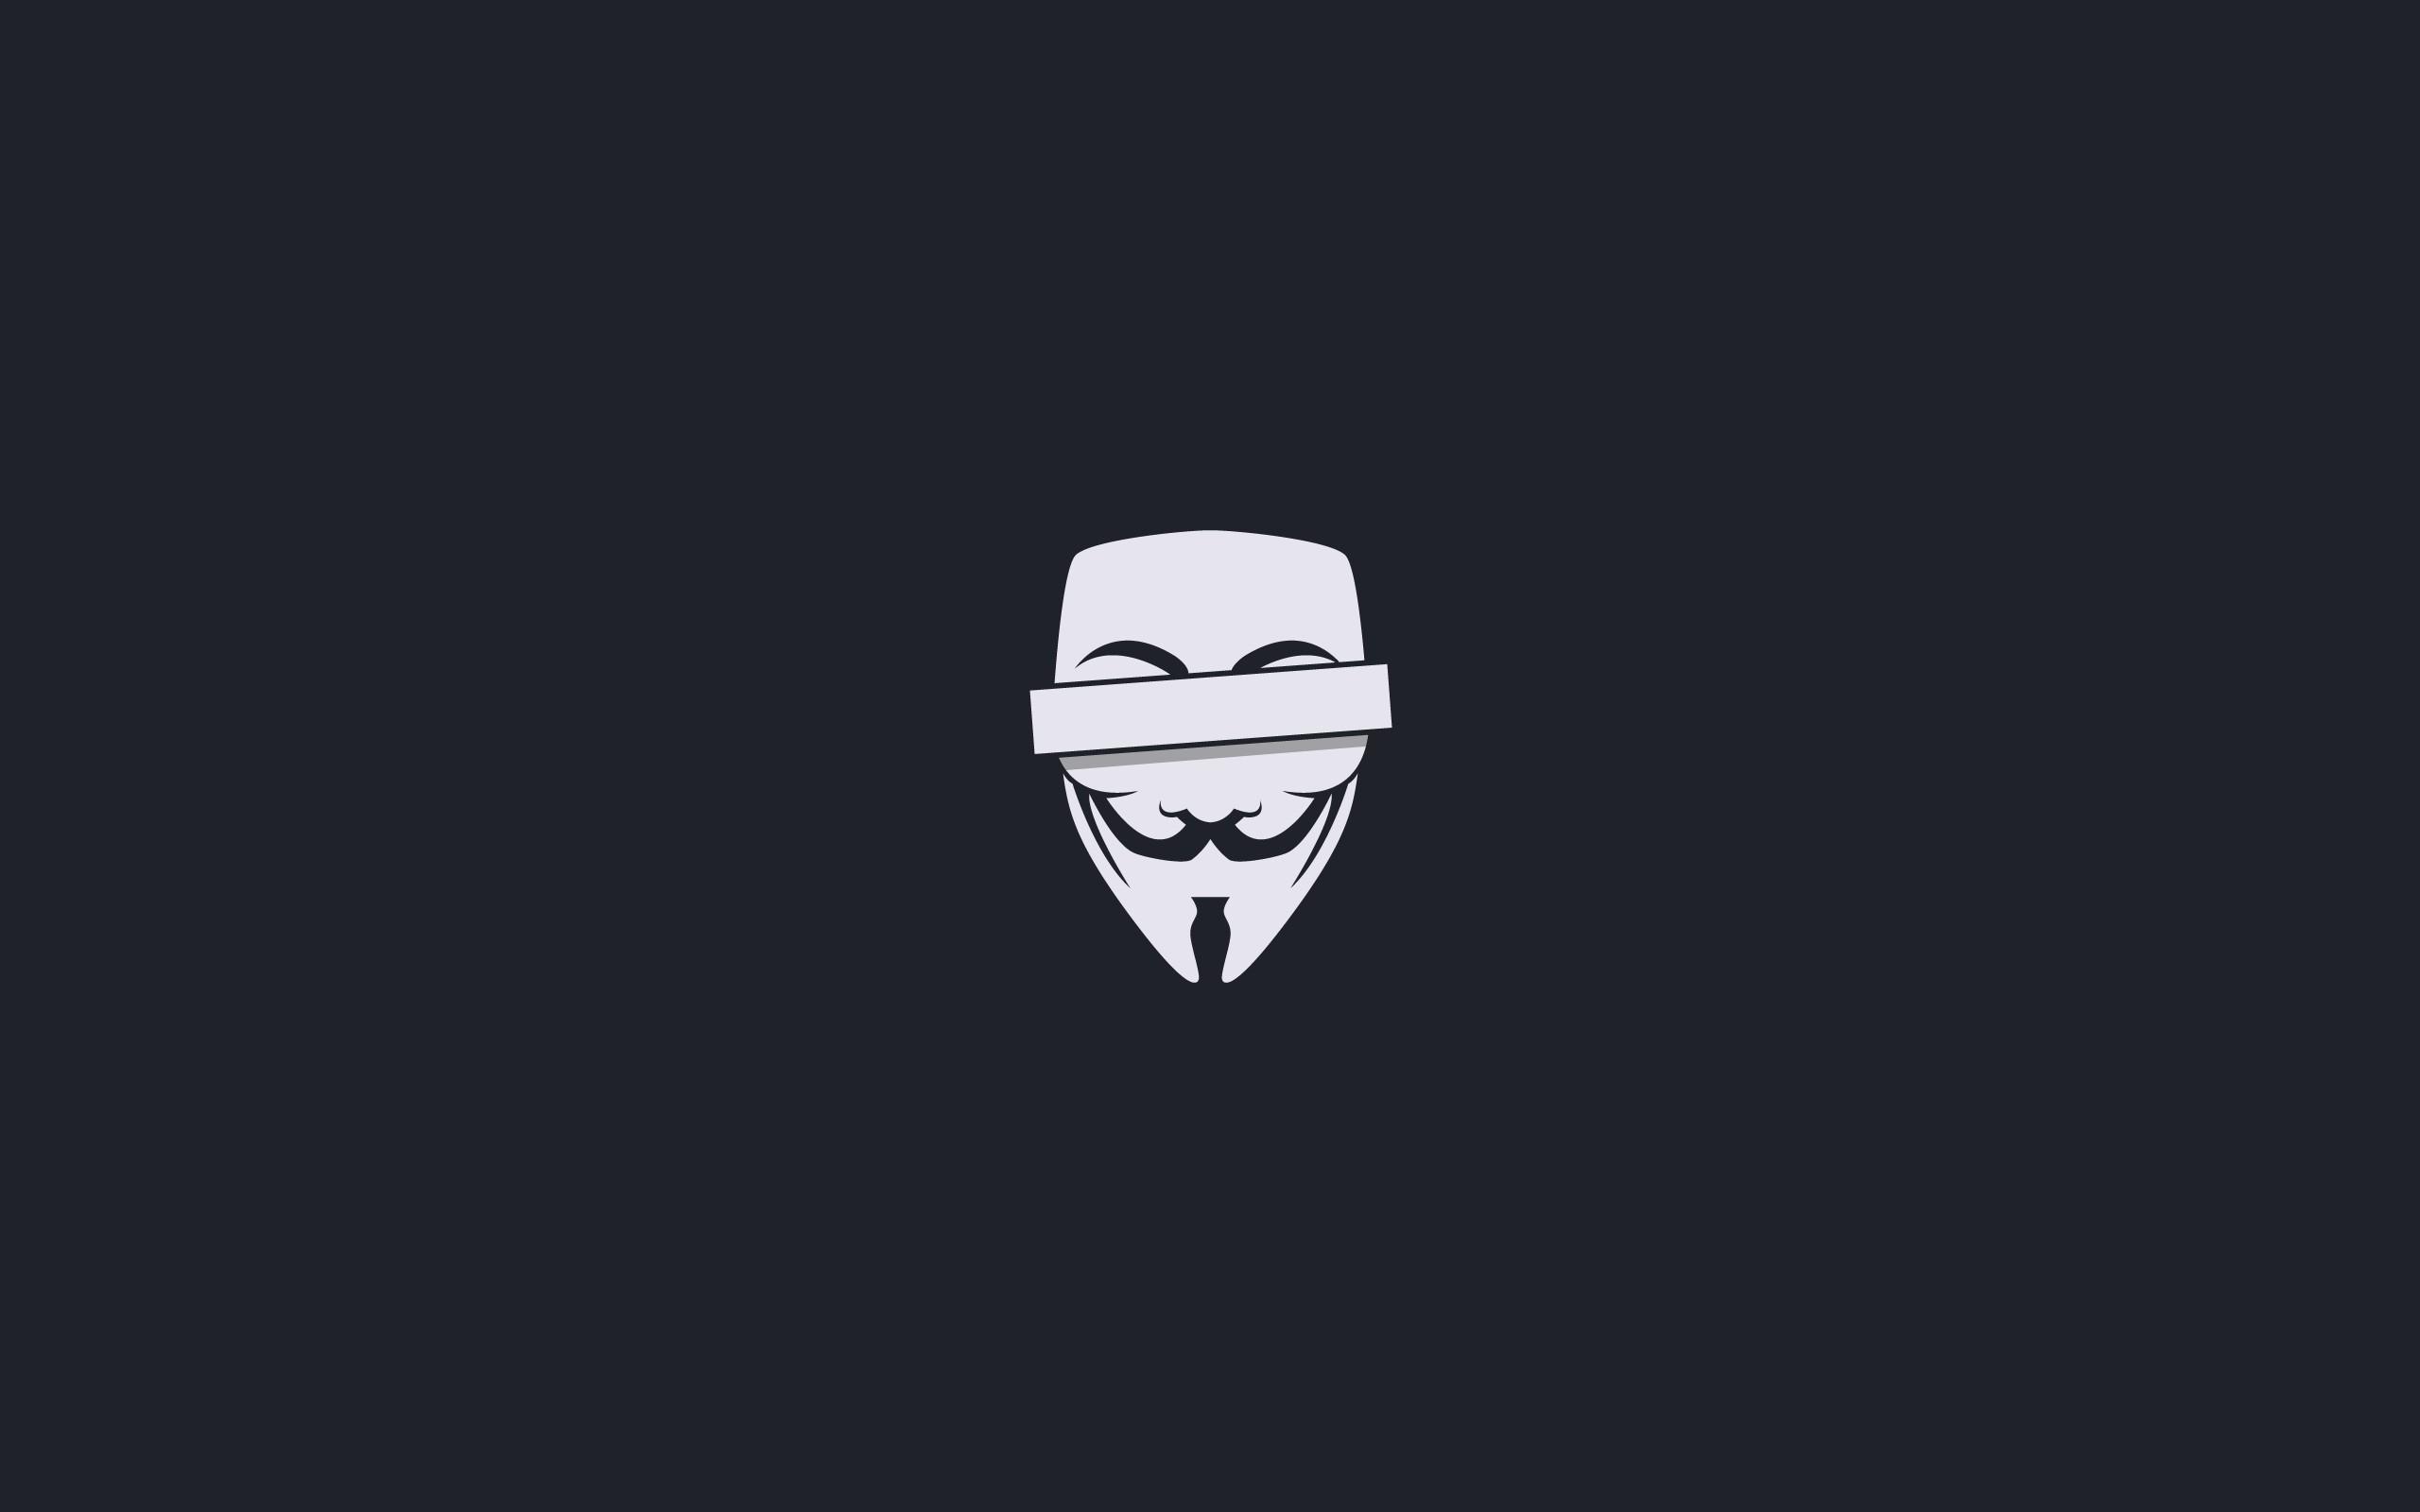 anonymous minimalistic censored masks guy fawkes v for vendetta simple  wallpaper Art HD Wallpaper